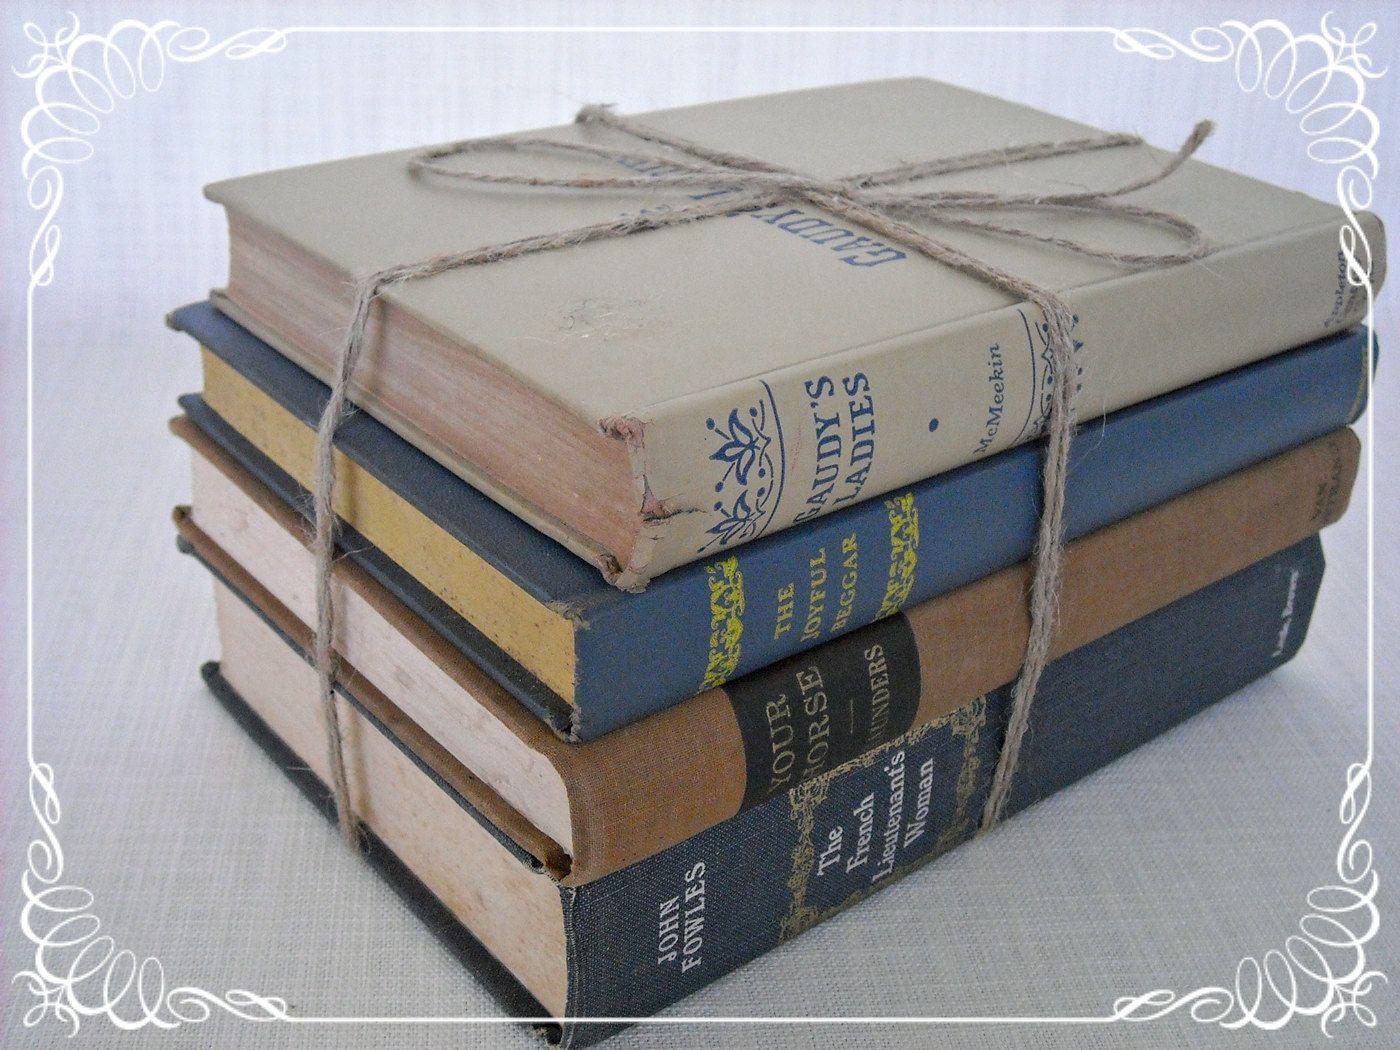 Book Bundle Collection Display Vintage Twine Bound. $18.00, via Etsy.